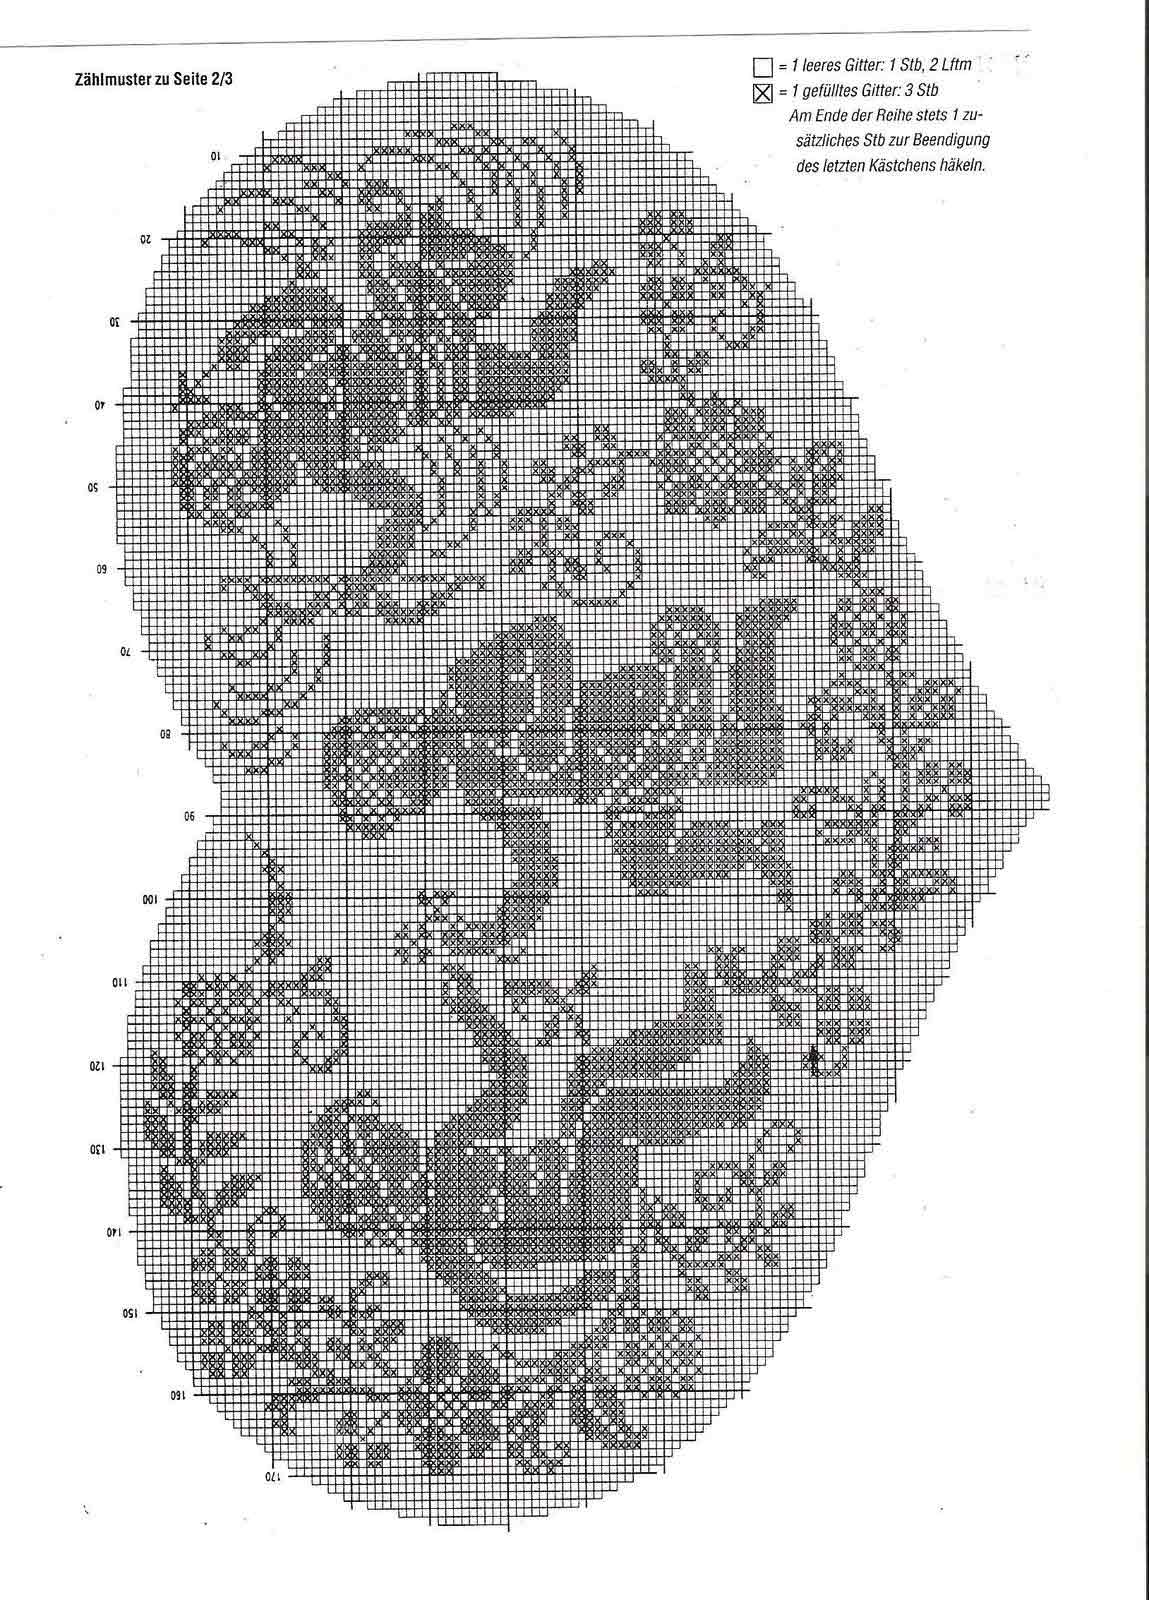 Разделы.  Автор: Admin Дата: 01.11.2013 Описание: Салфетки - Вязание крючком.